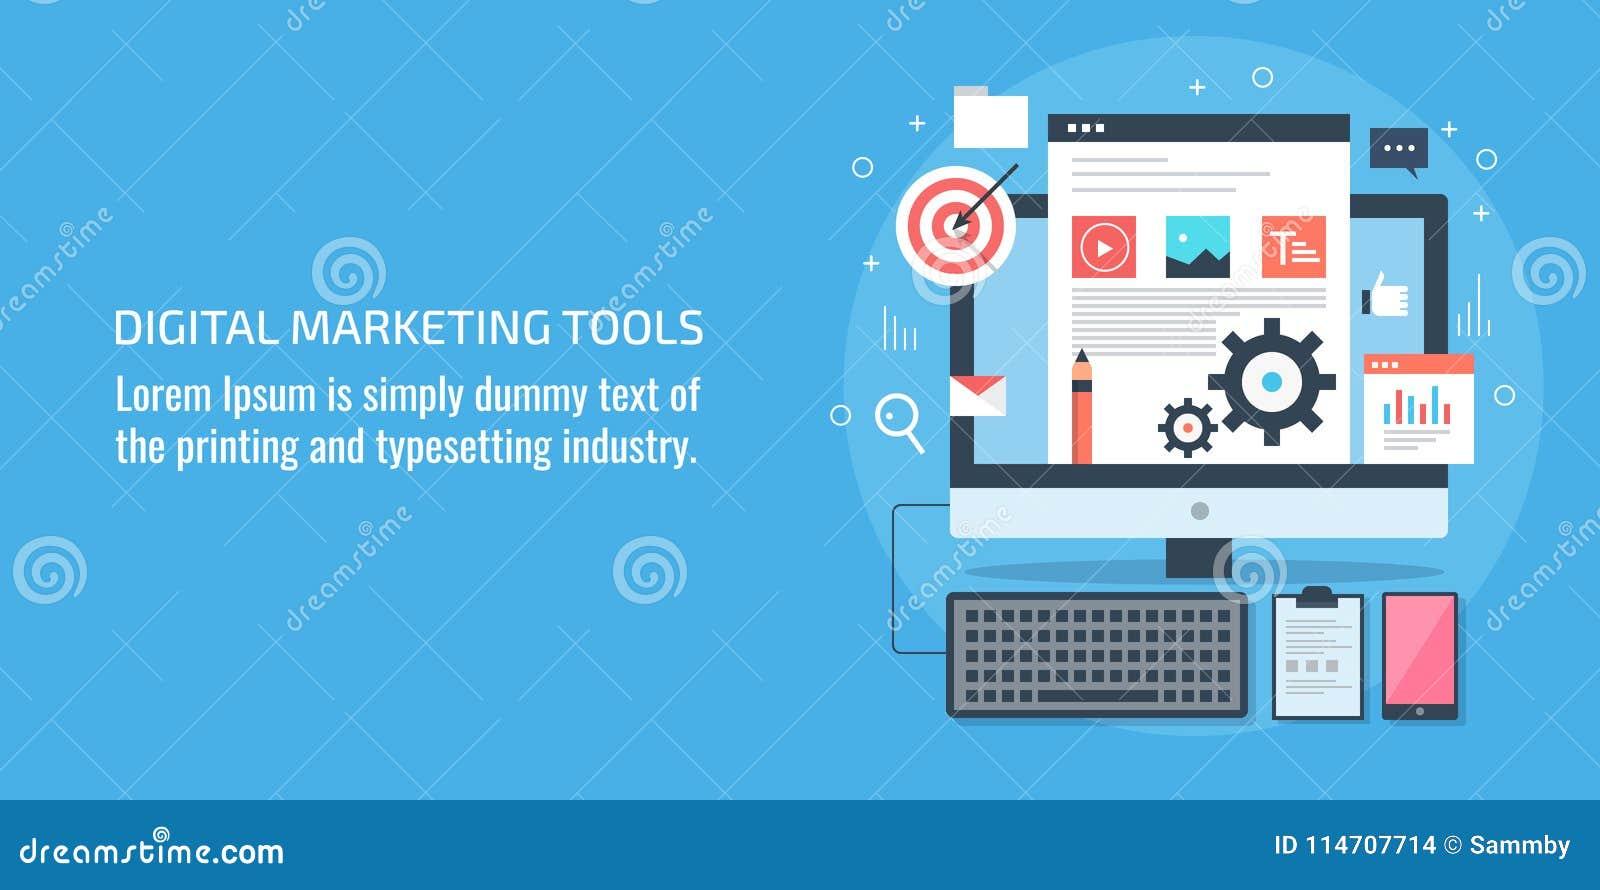 Digital marketing tools, work place, digital device, content, software concept, Flat design vector banner.